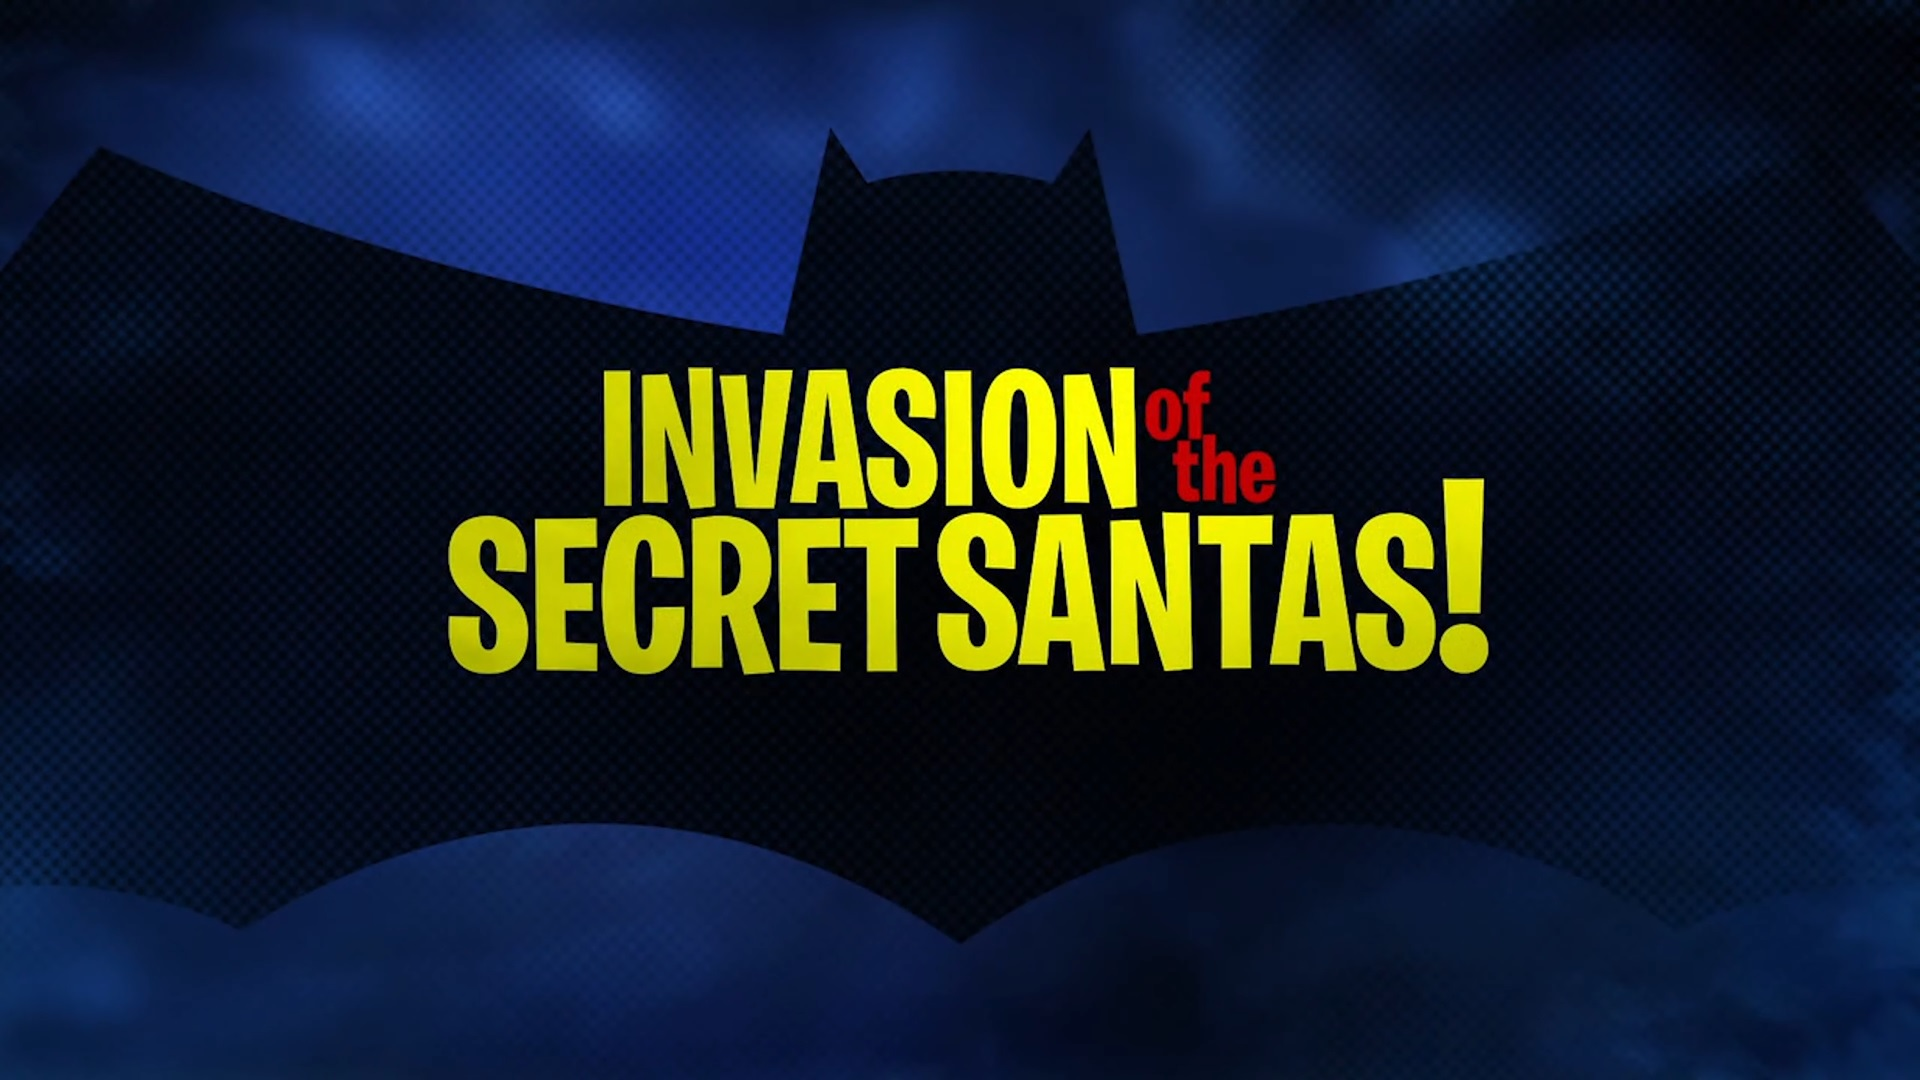 File:InvasionOfTheSecretSantas.jpg